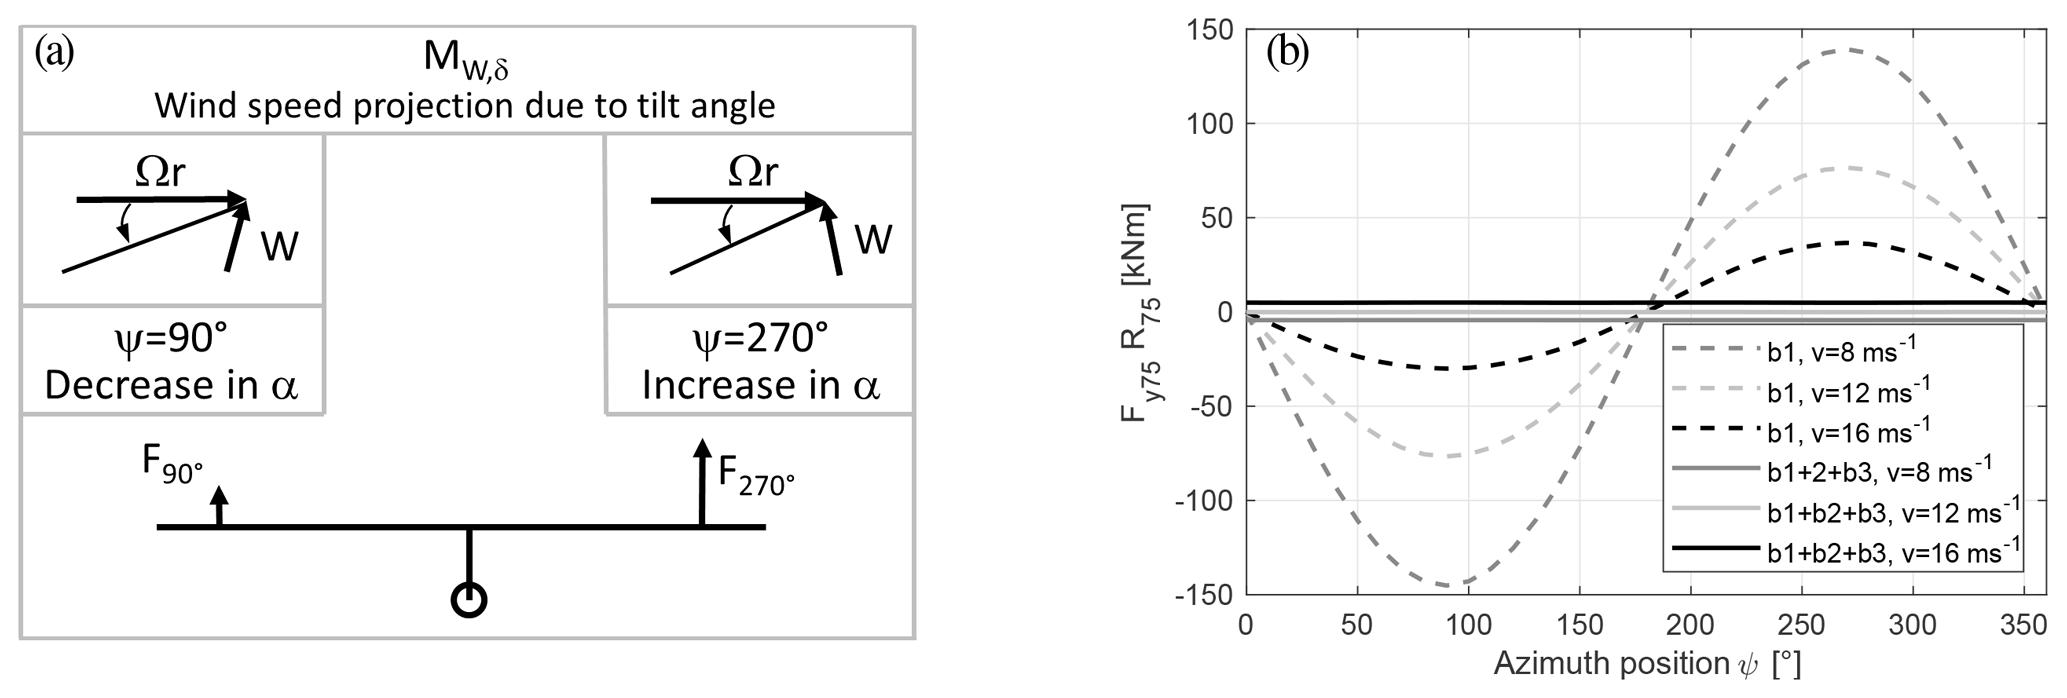 WES - Qualitative yaw stability analysis of free-yawing downwind